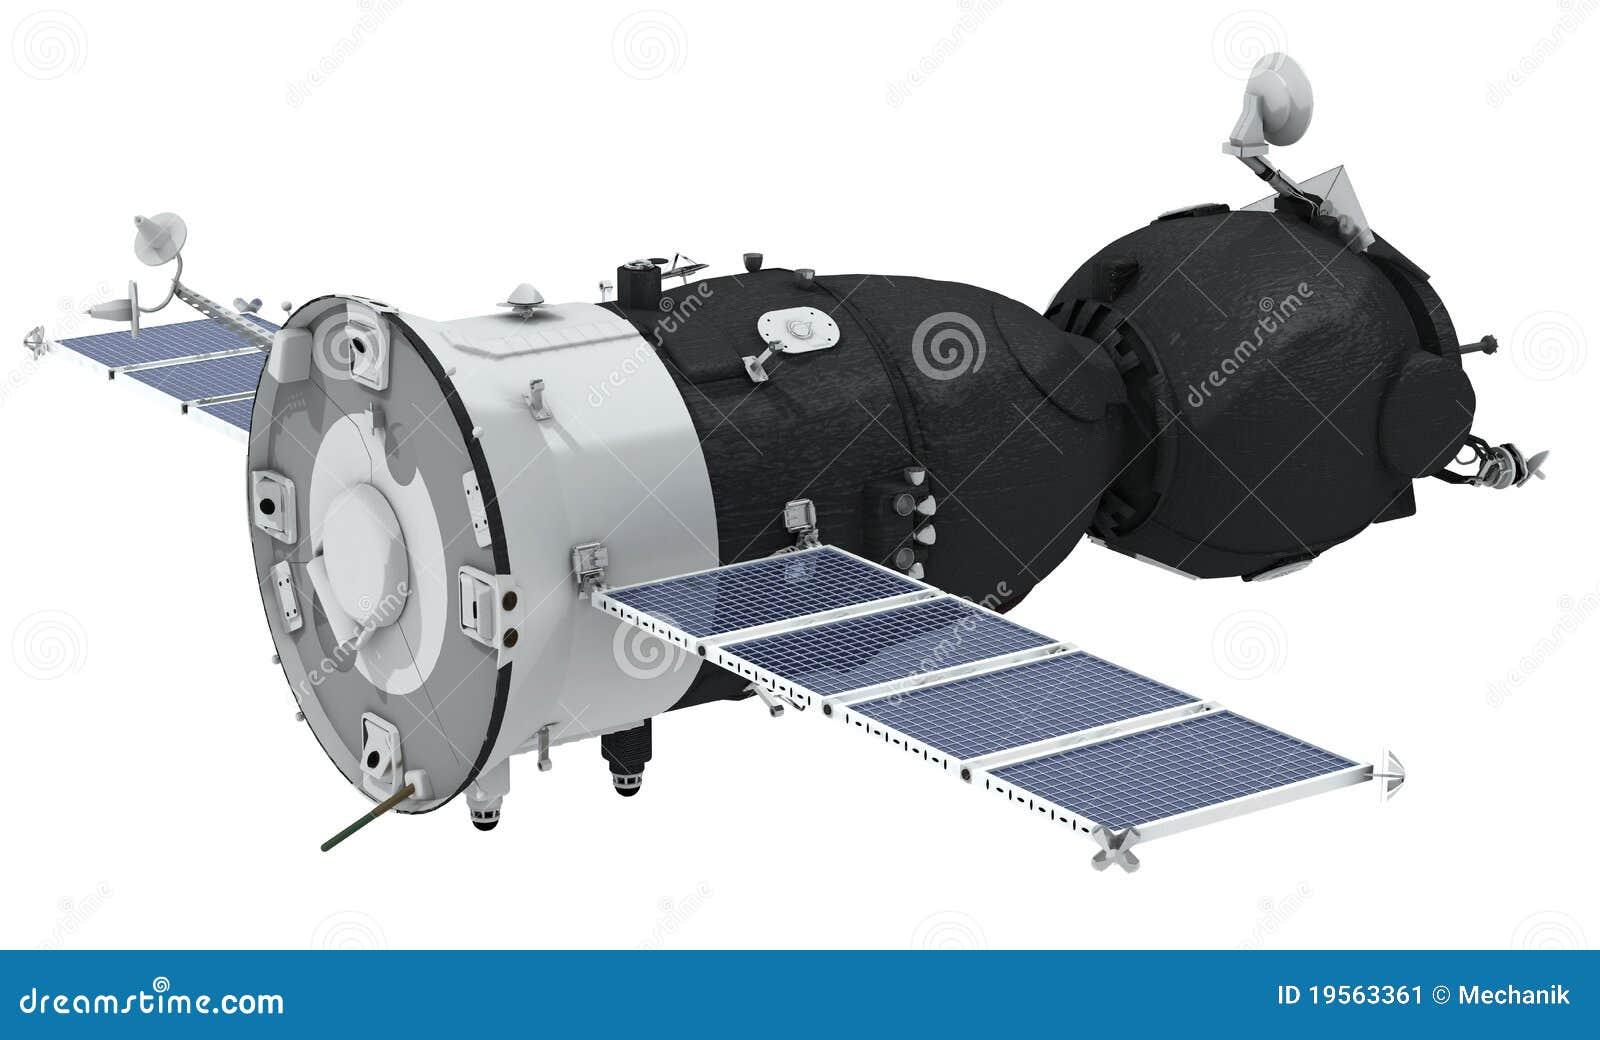 Nave espacial isolada